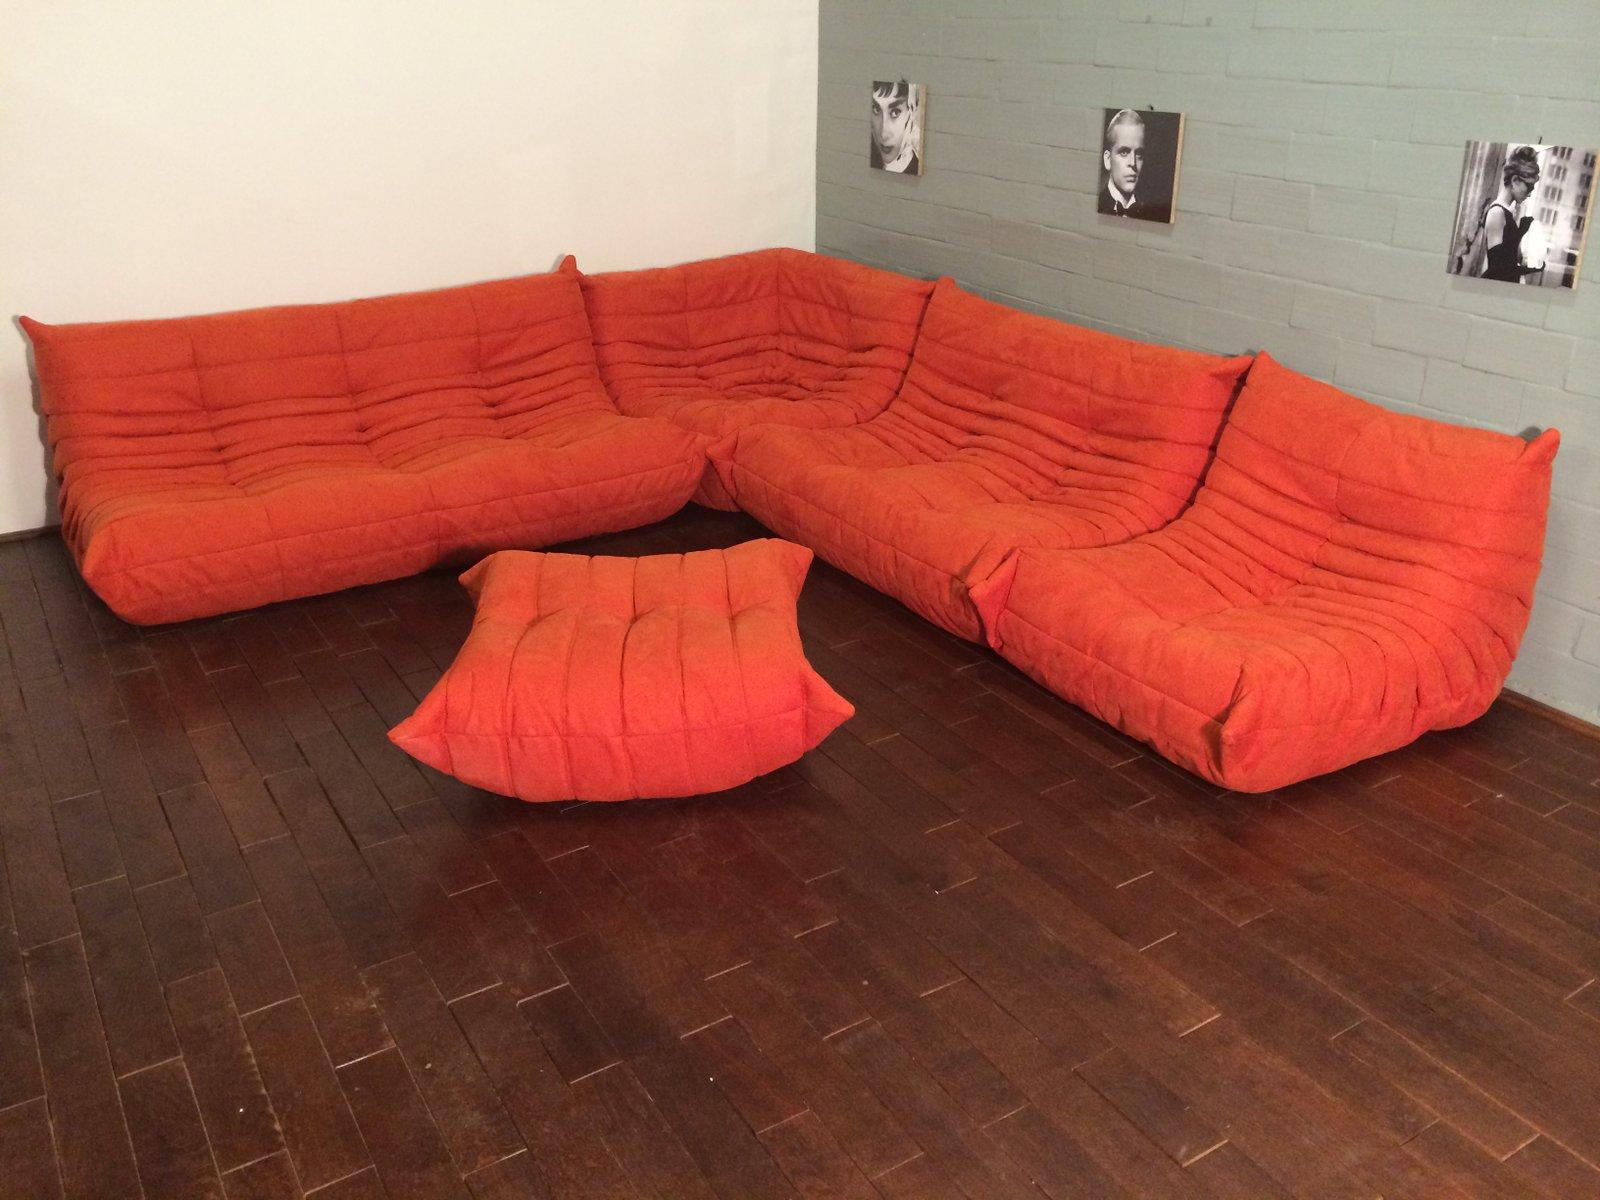 set de canap togo orange en microfibre par michel ducaroy. Black Bedroom Furniture Sets. Home Design Ideas